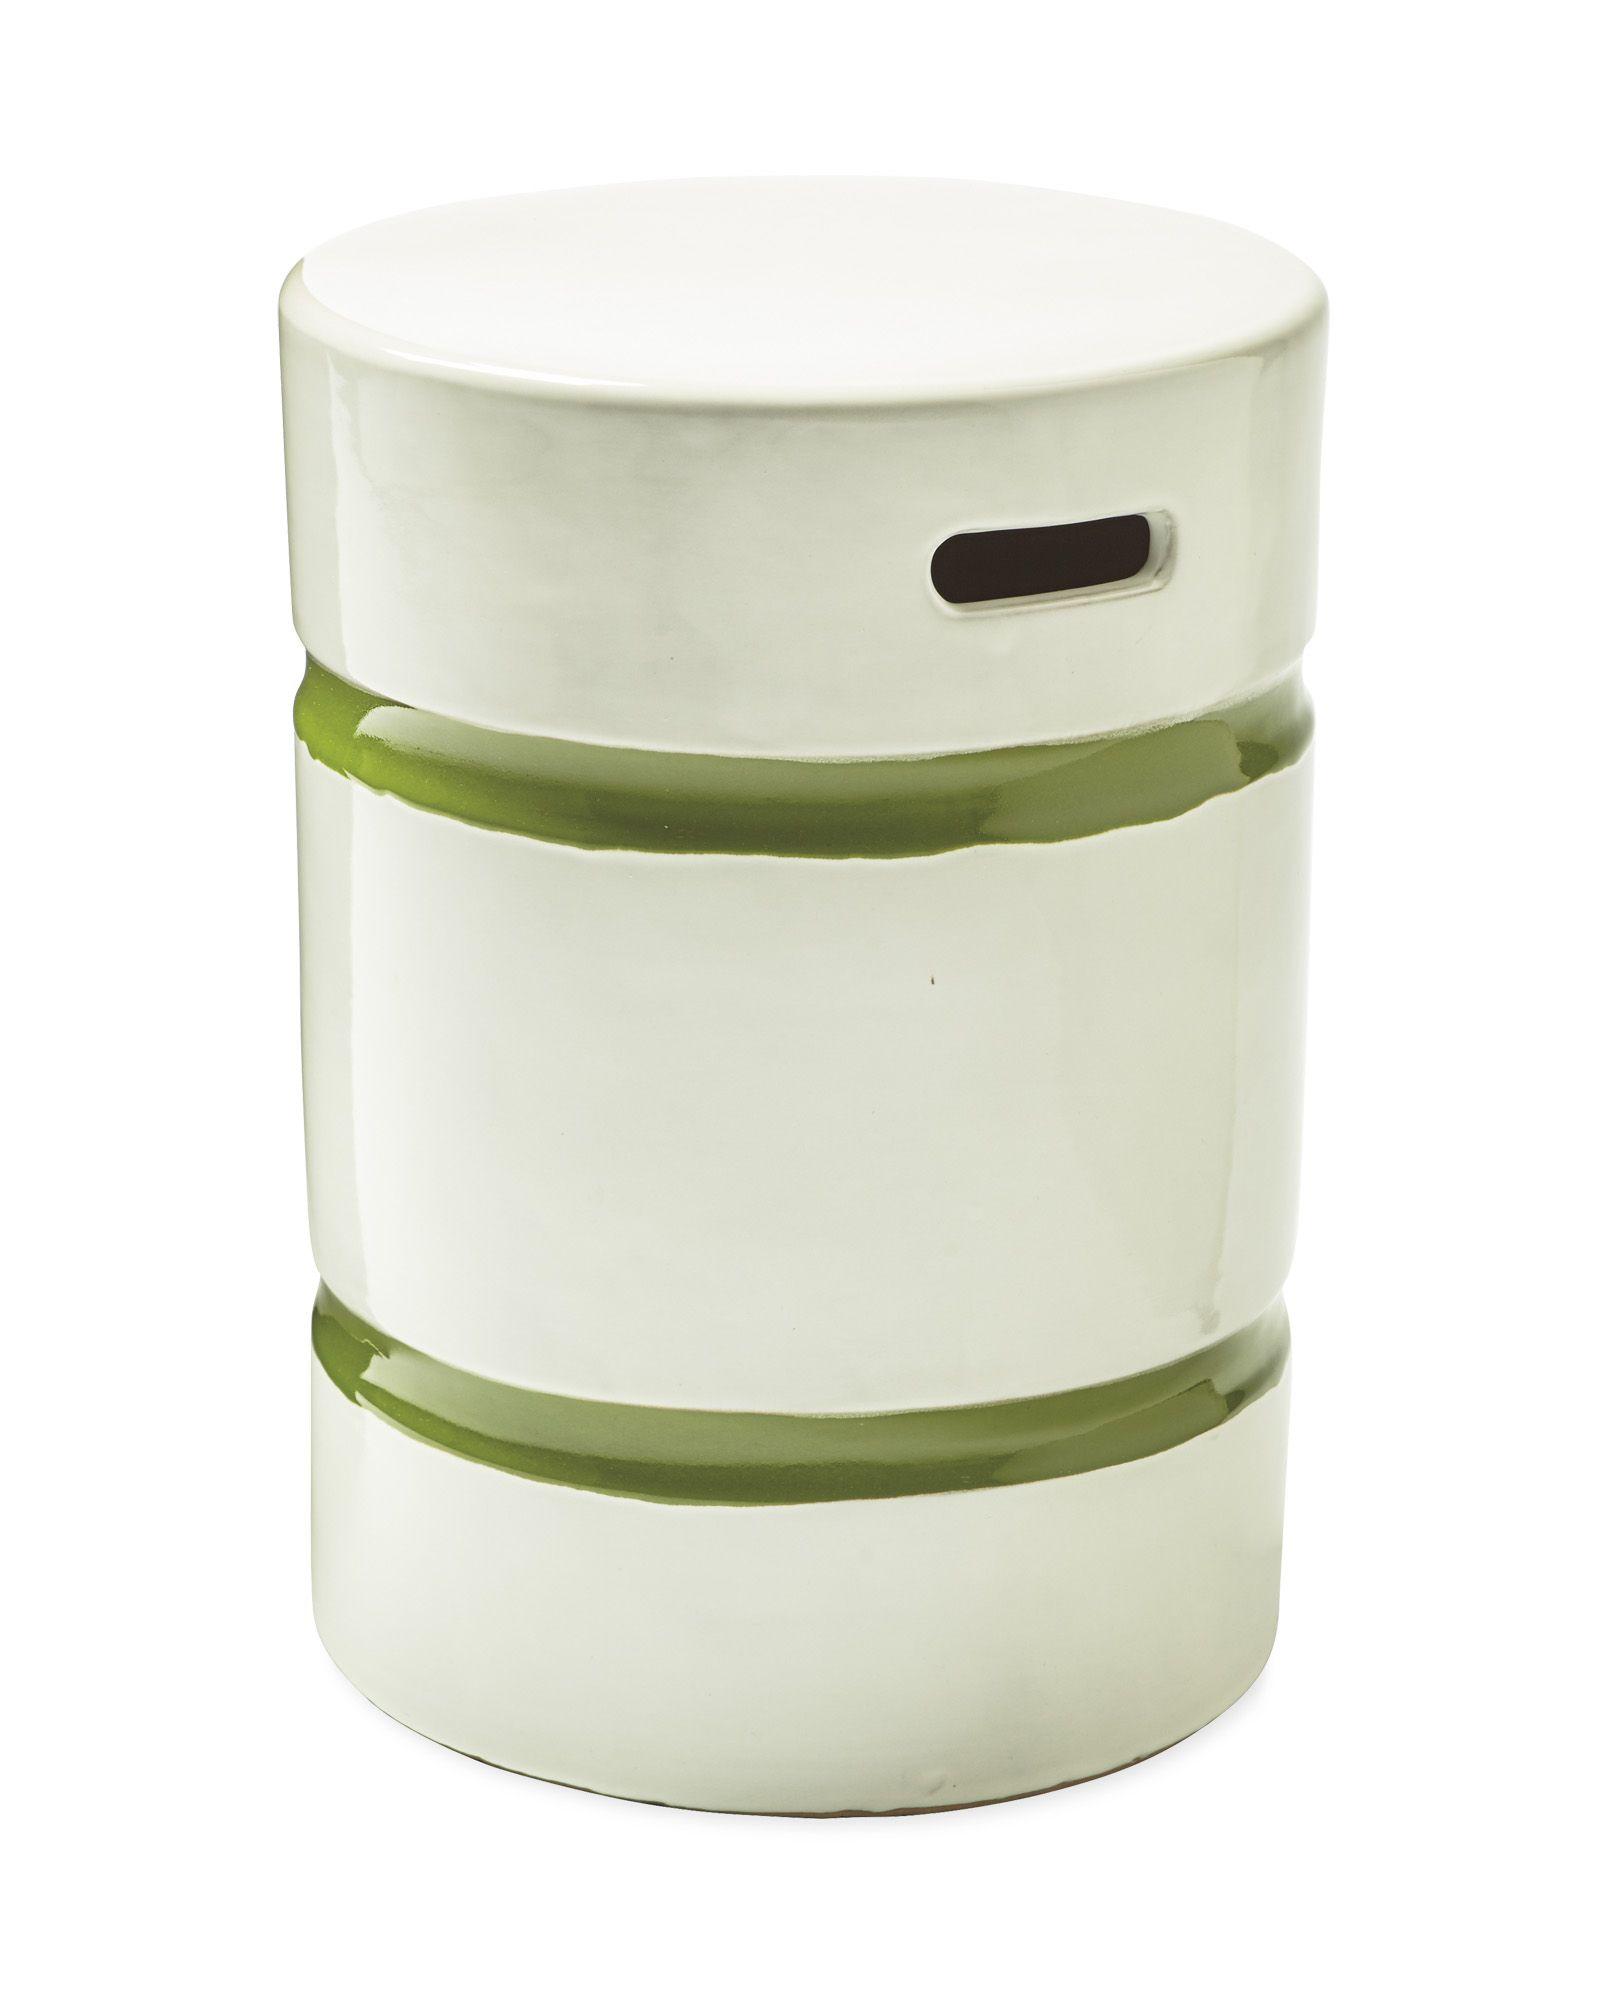 Super Round Sebastopol Stool Bone Green Serena Lily Squirreltailoven Fun Painted Chair Ideas Images Squirreltailovenorg